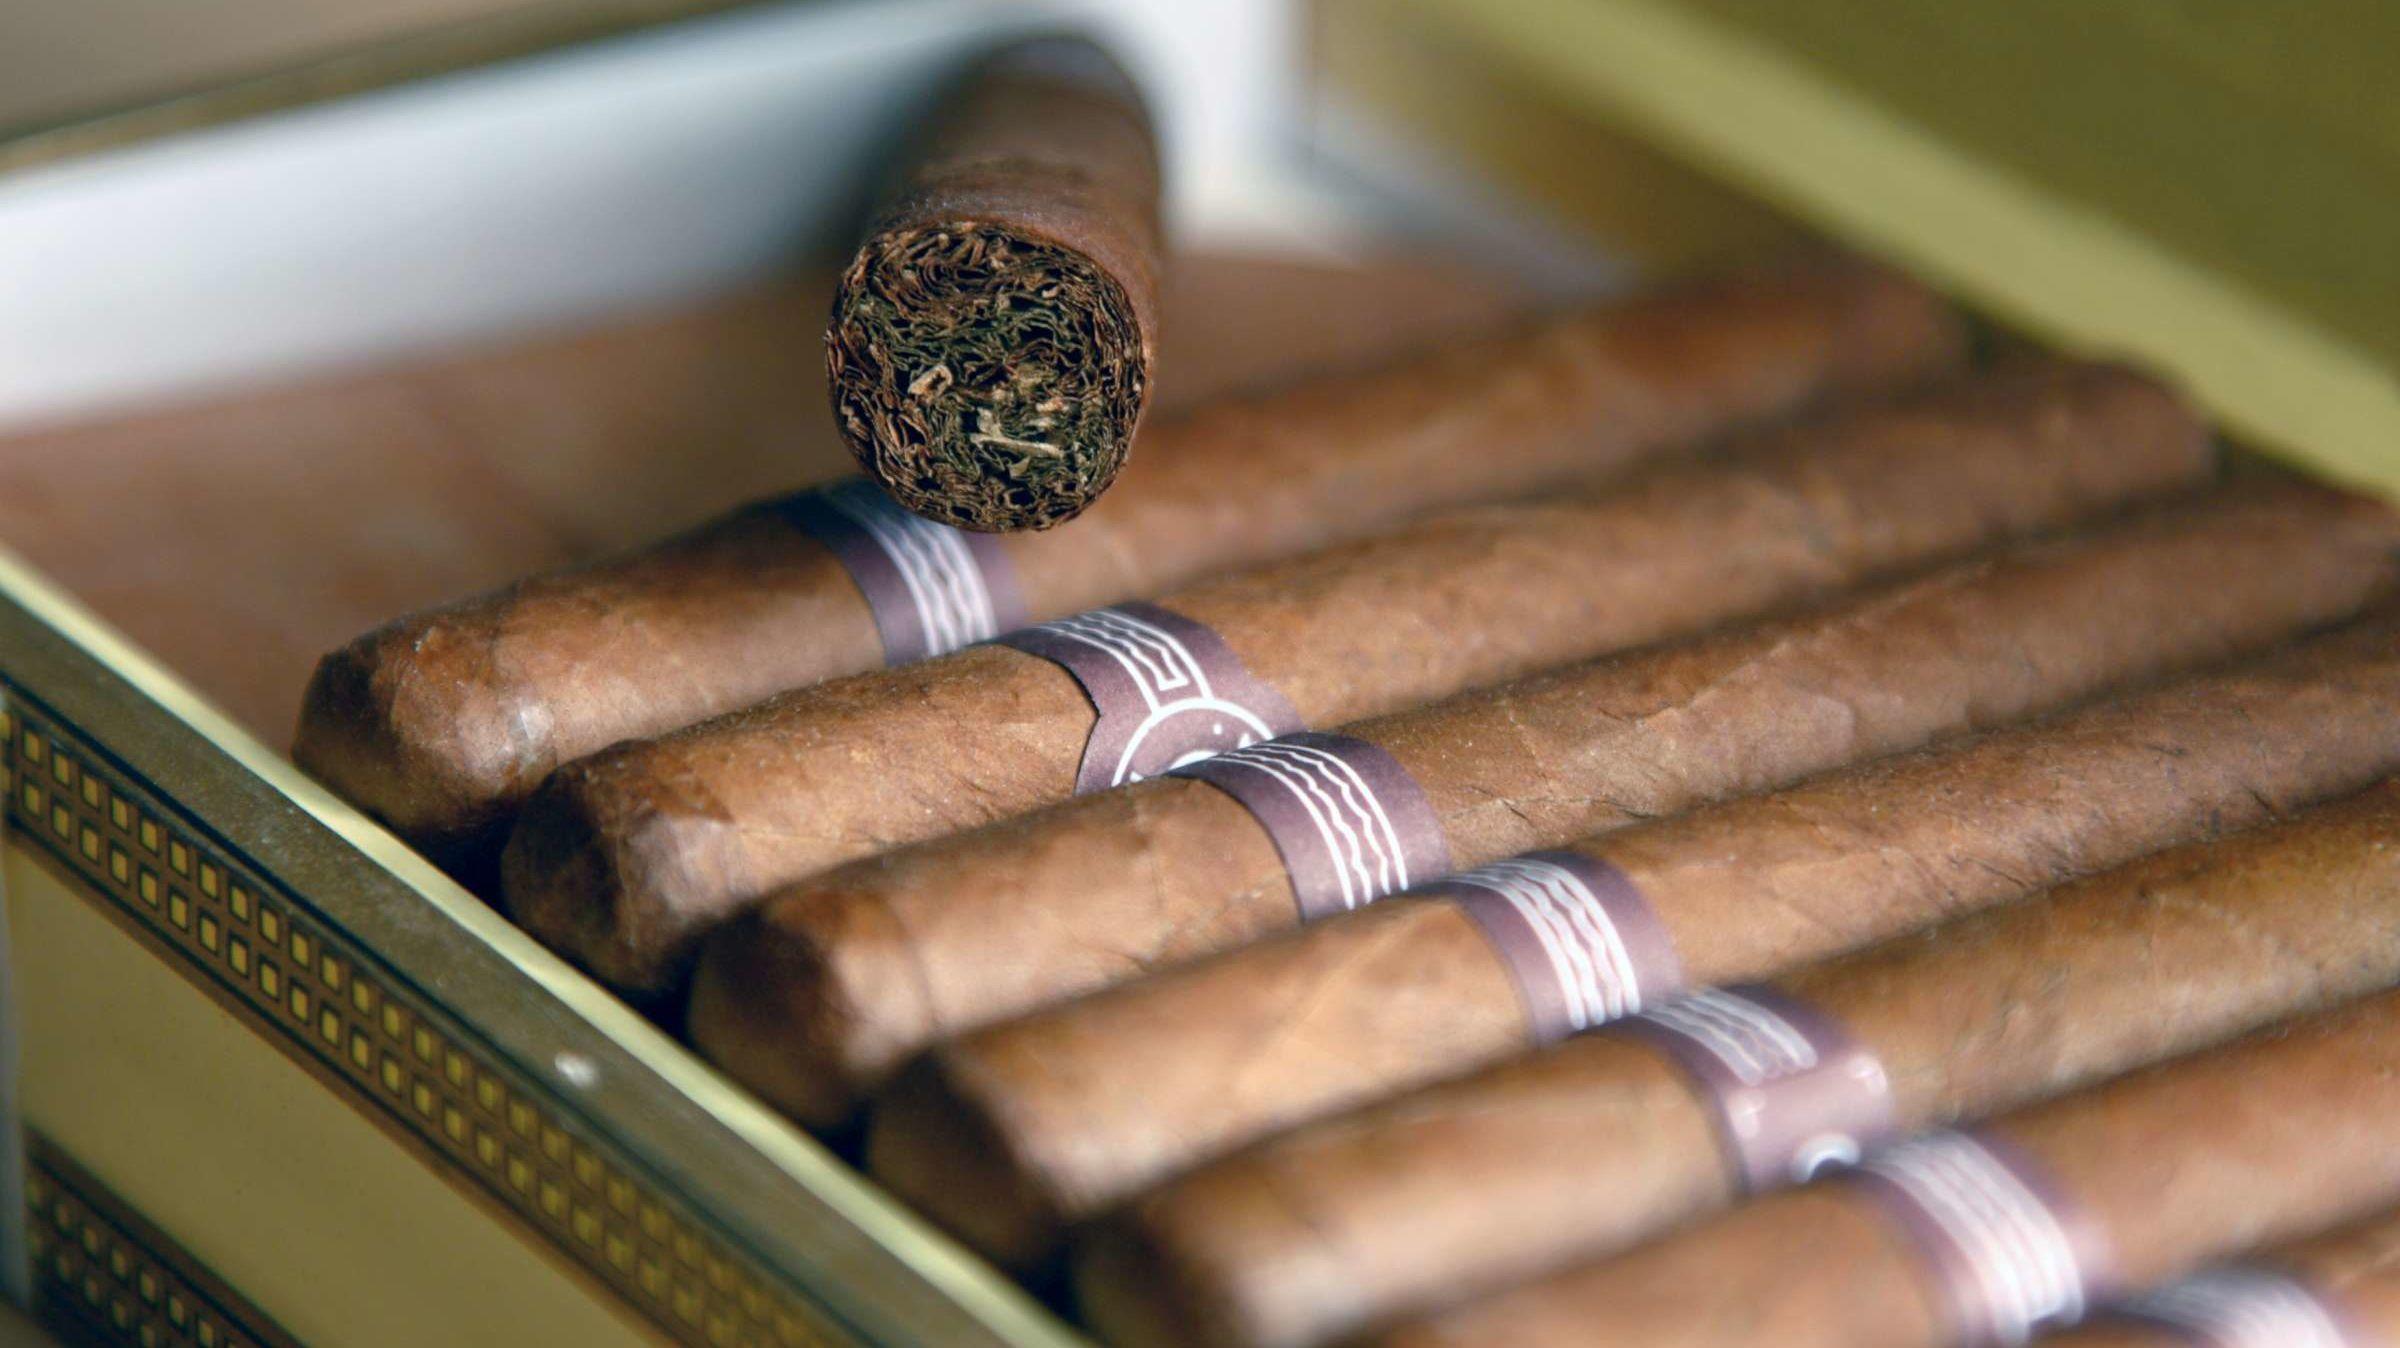 Why Do We Say 'Close, But No Cigar'?